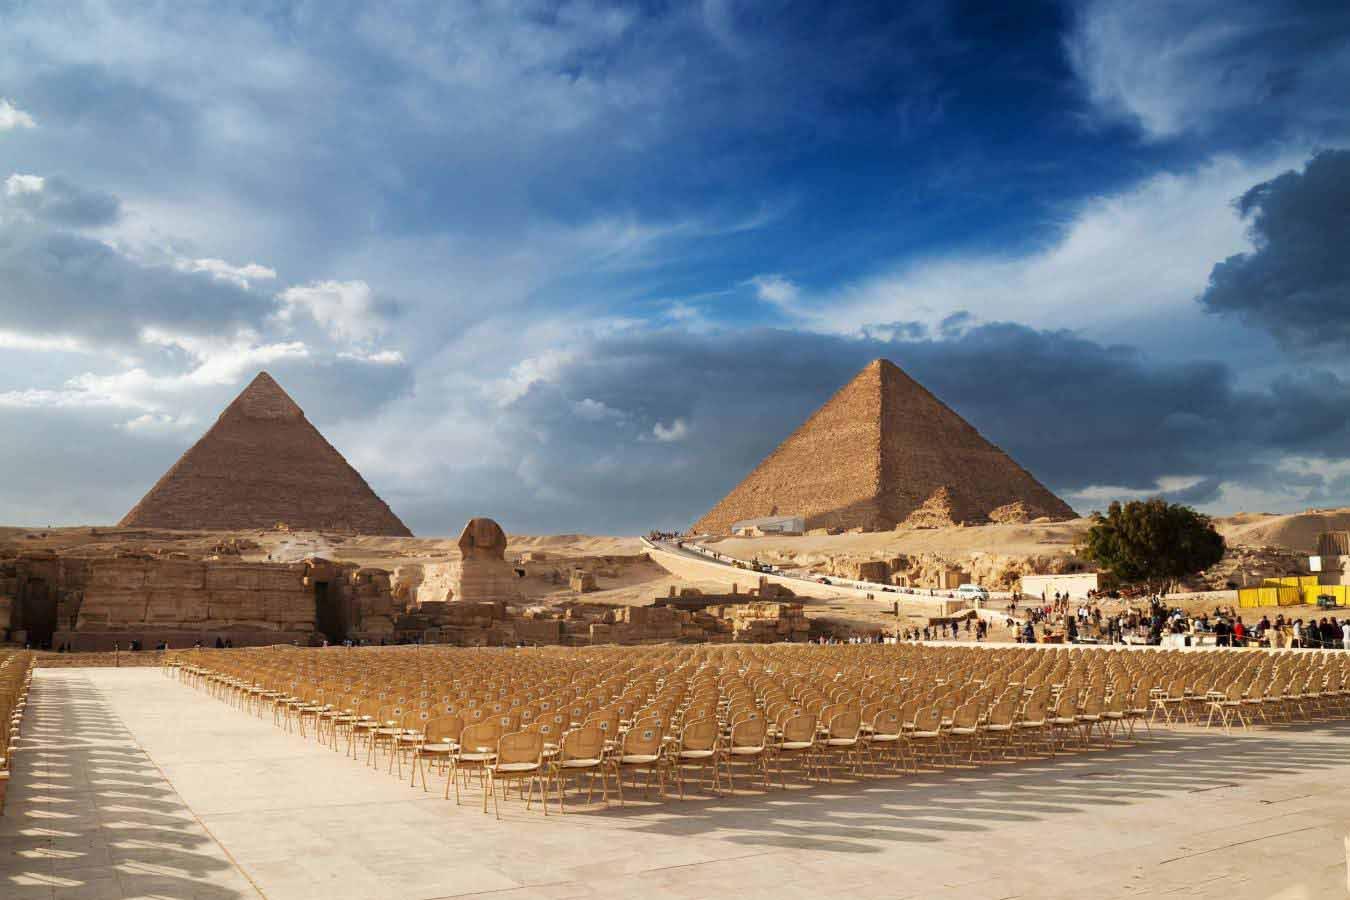 Giza Pyramids | Cairo Tour by air from Hurghada